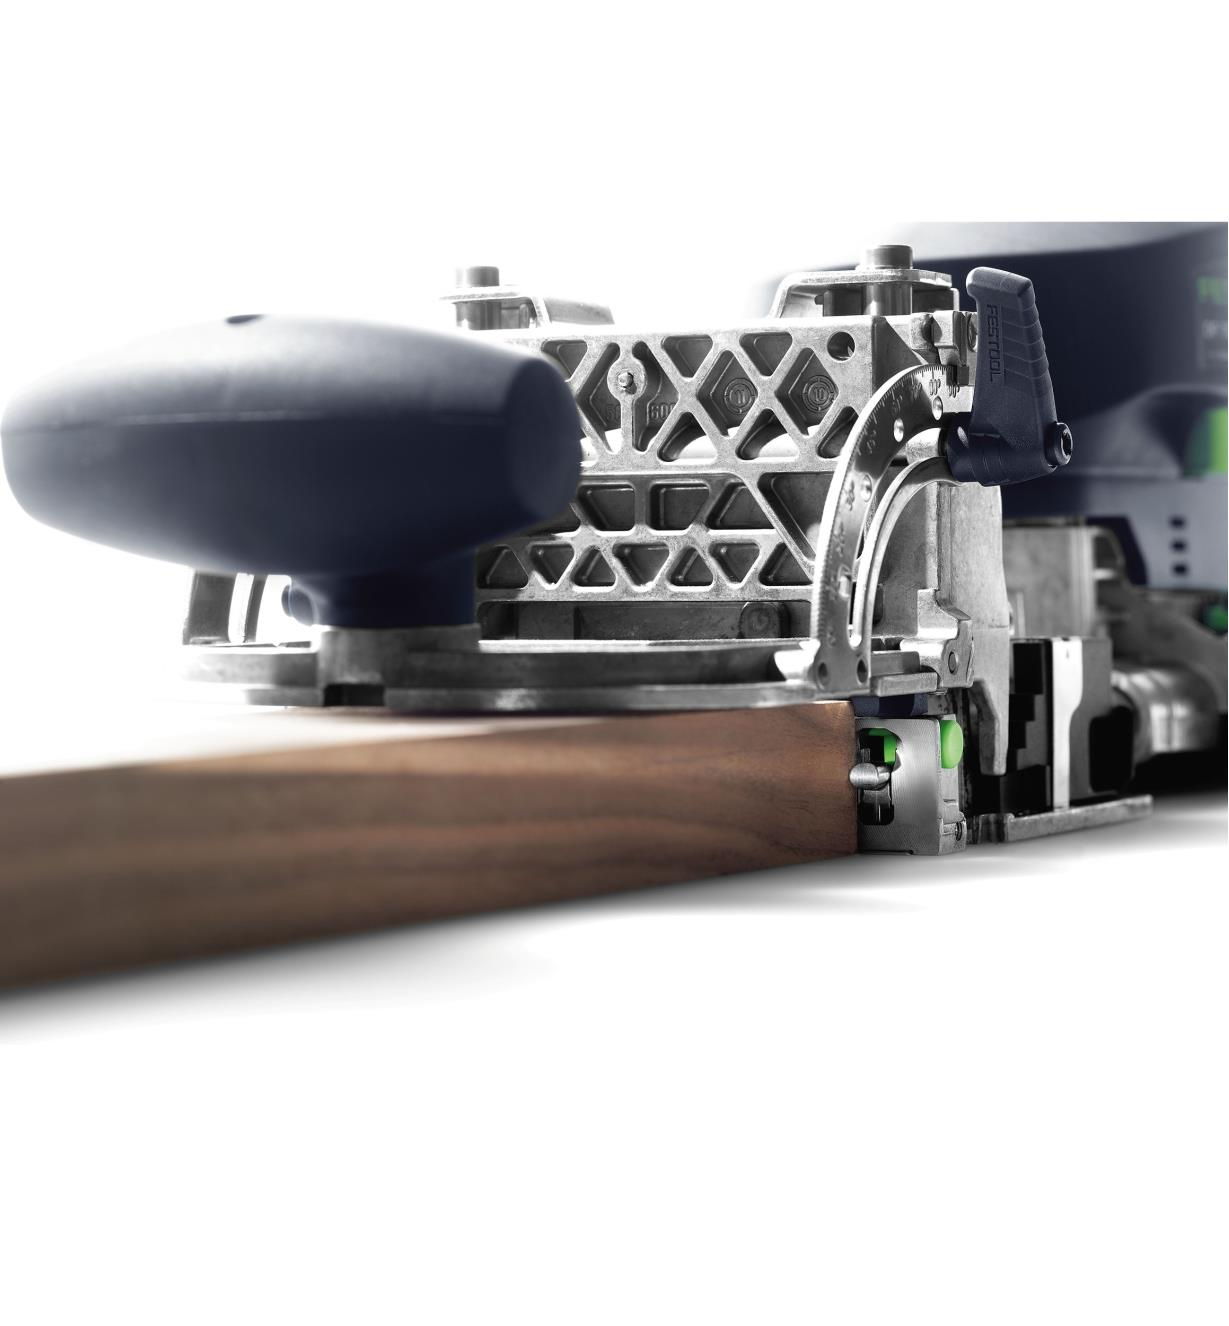 ZT574422 - Fraiseuse Domino DF 700